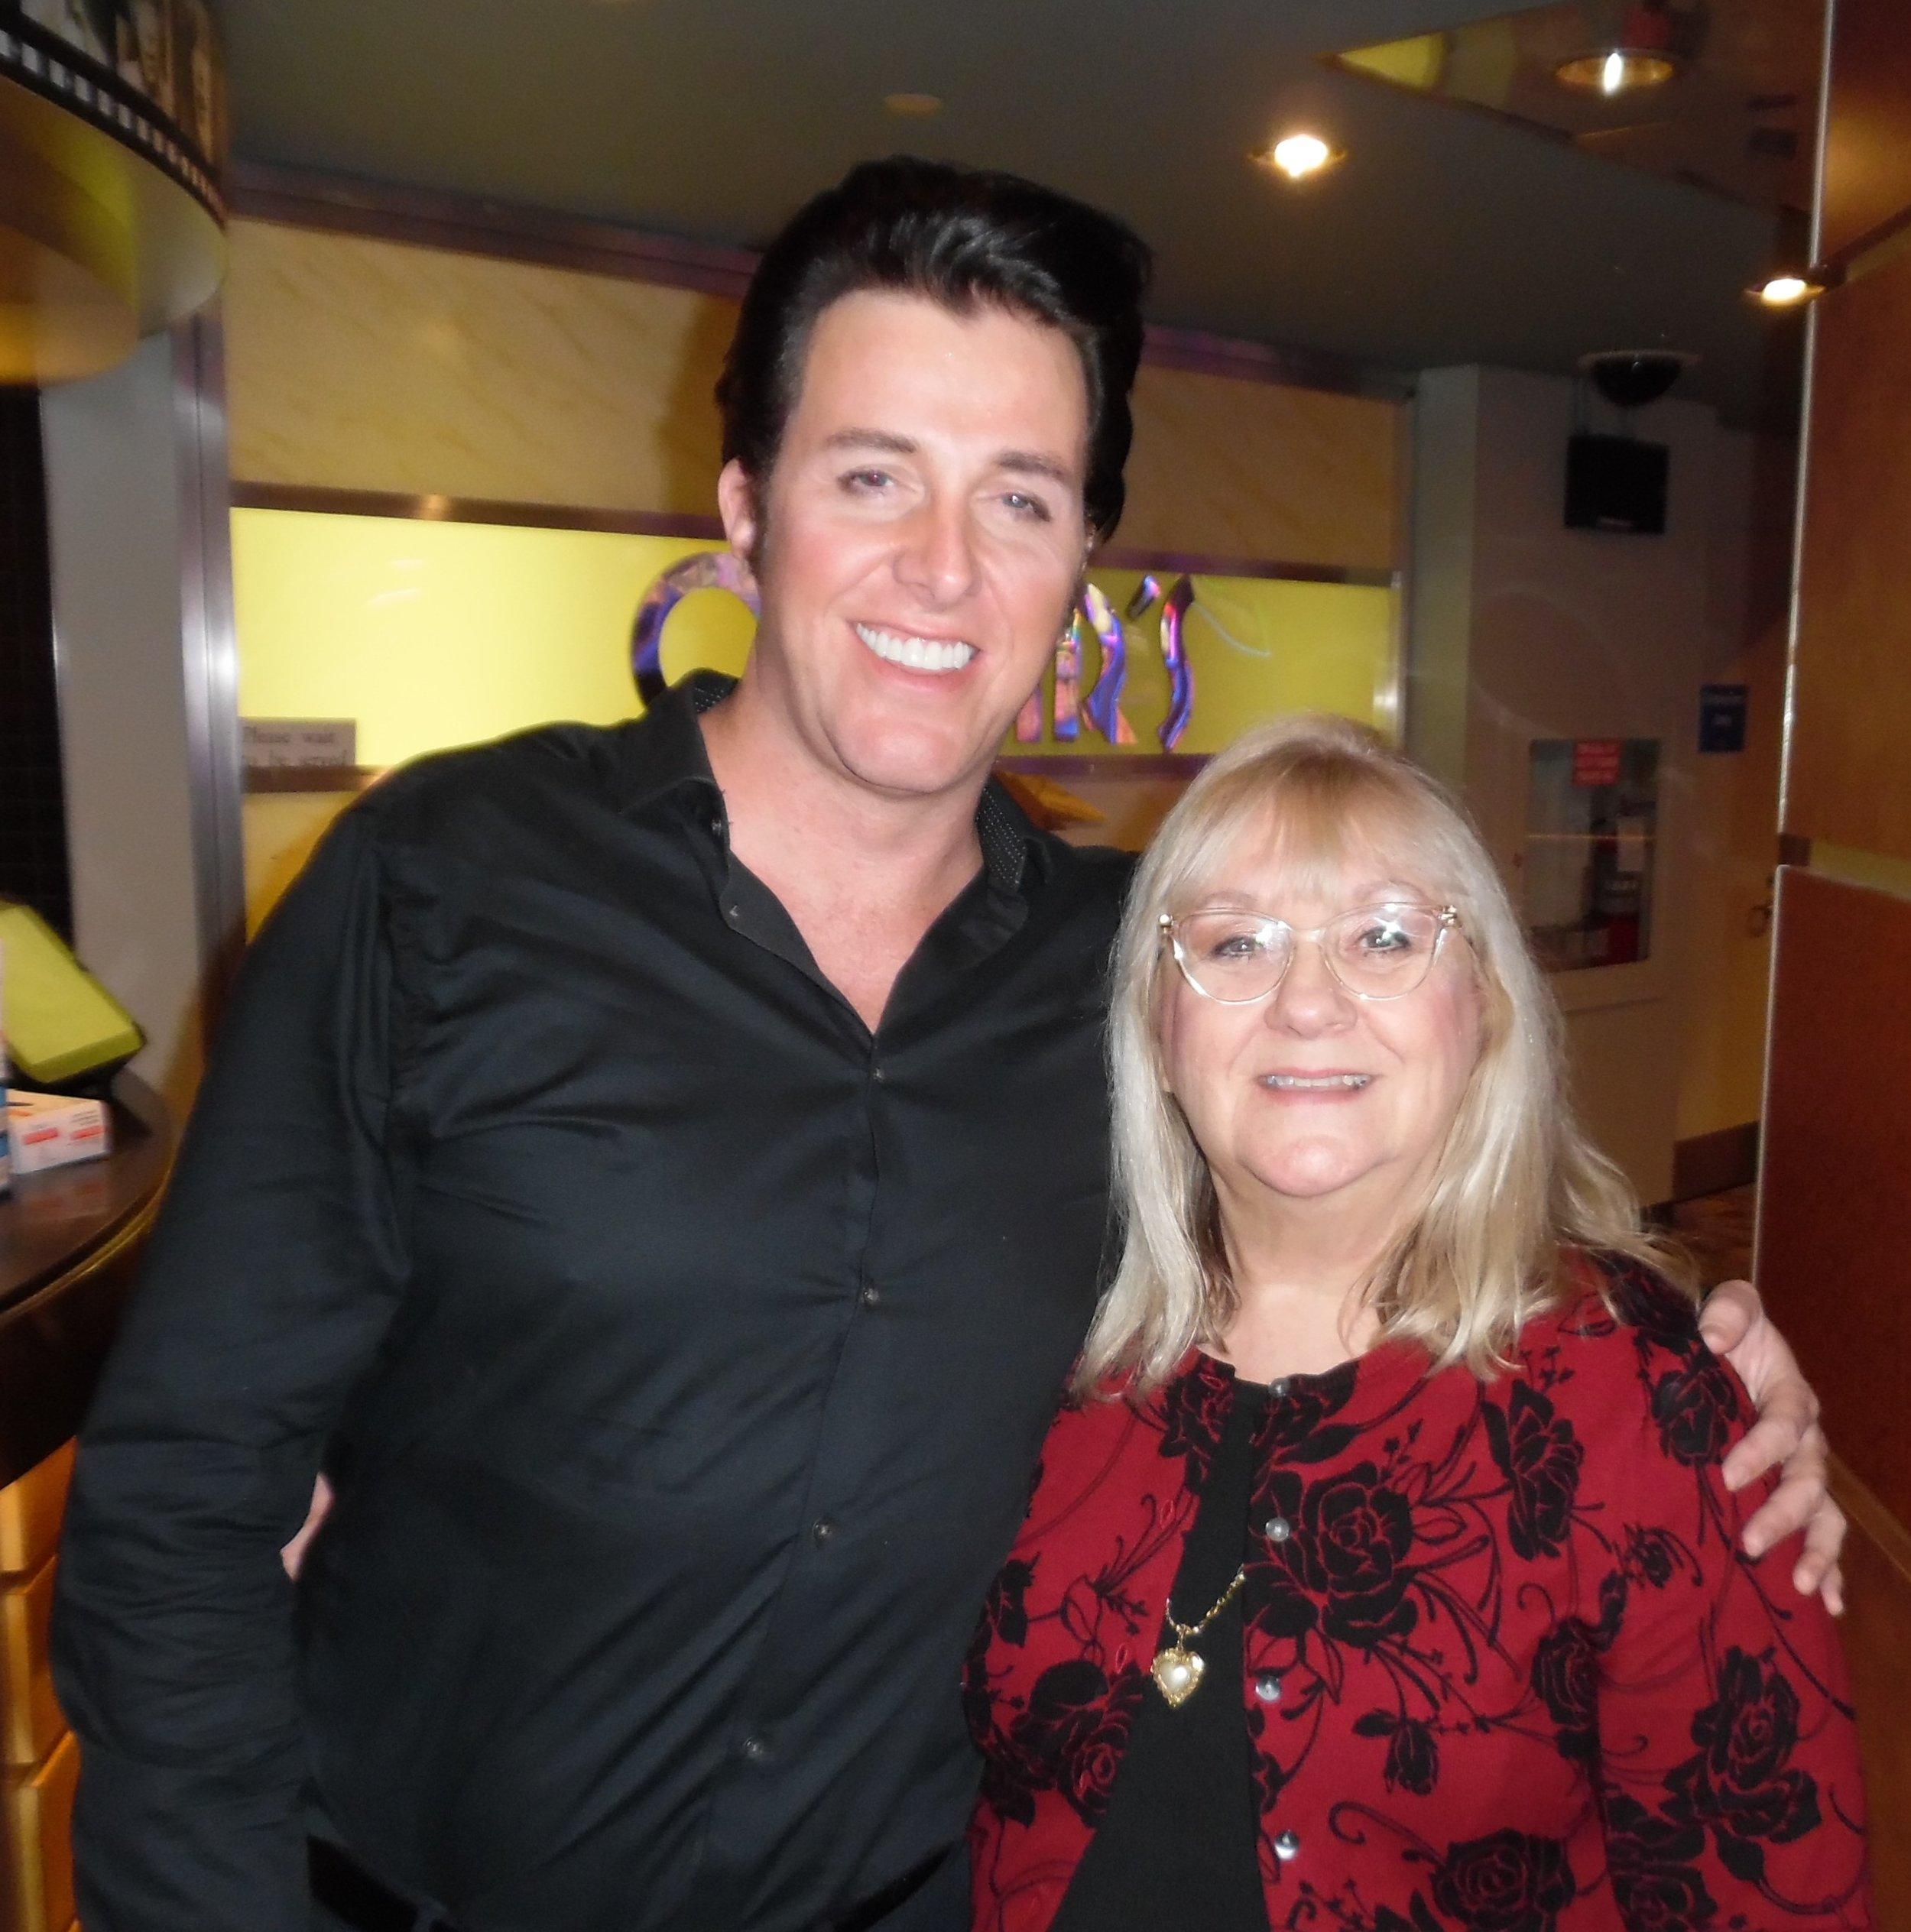 ETA  Mage Cage  with Carolyn MacArthur, Editor of SIDEBURNS Magazine, at Matt's show at Mohawk Raceway, Friday, February 9th, 2018.